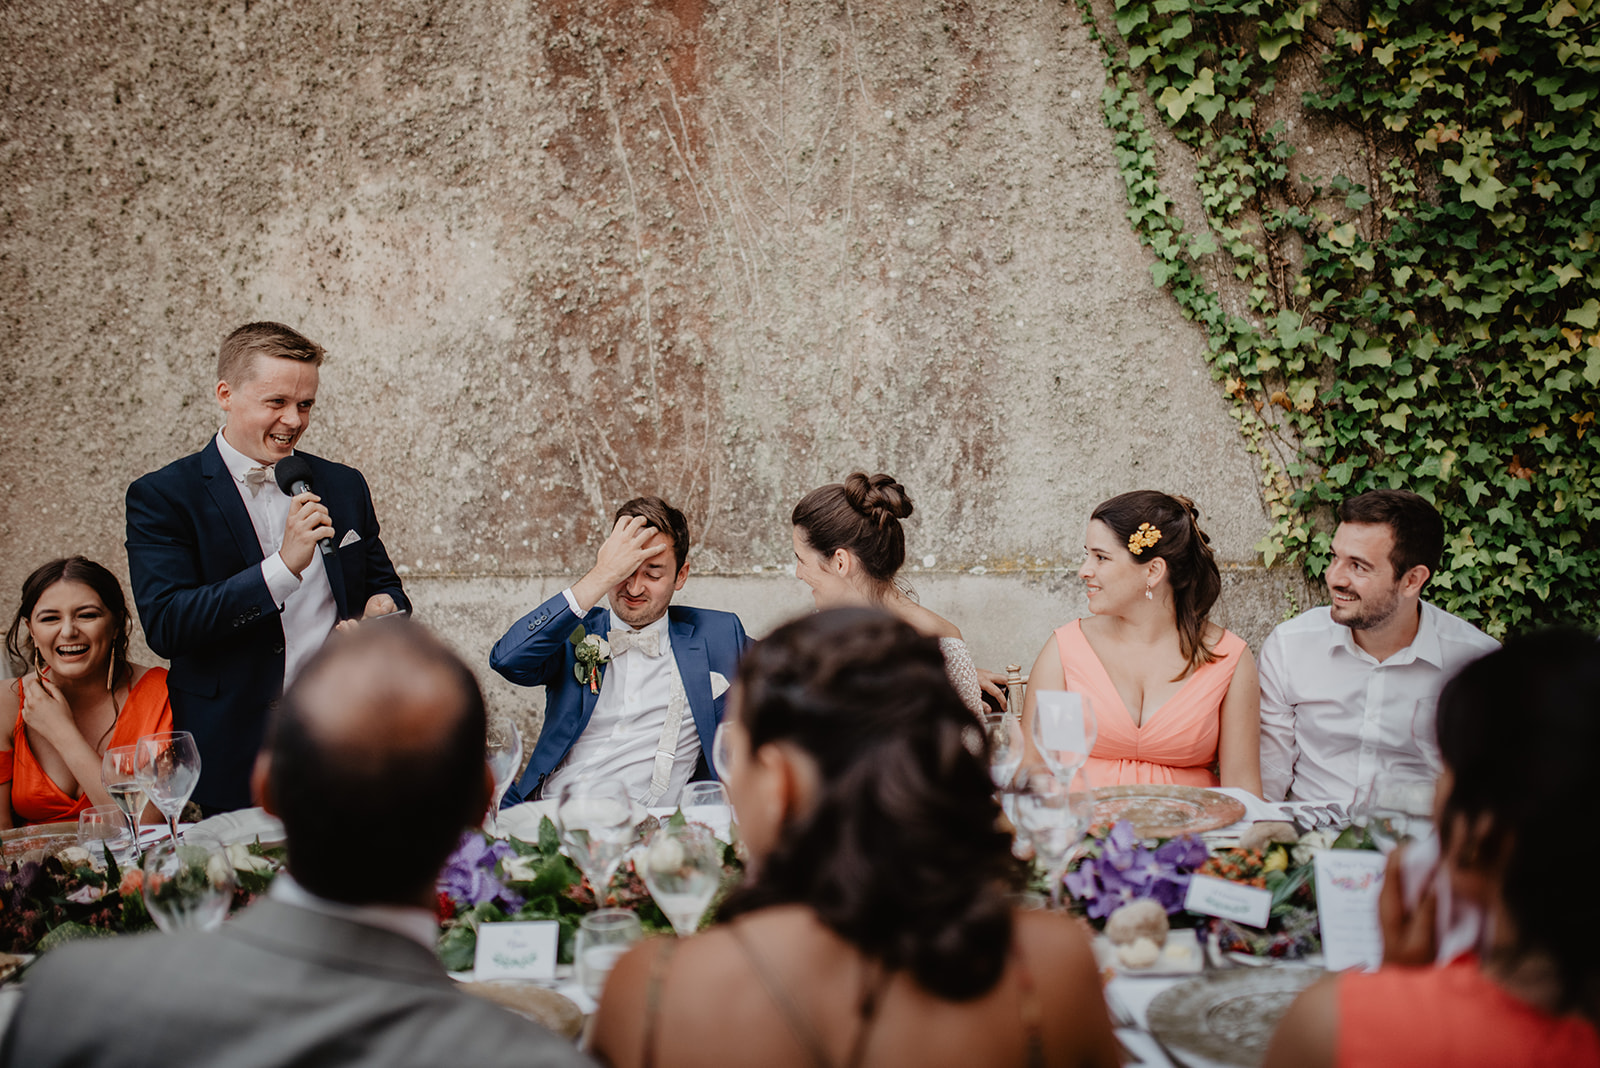 Lapela-photography-wedding-algarve-portugal-best-of-33.jpg